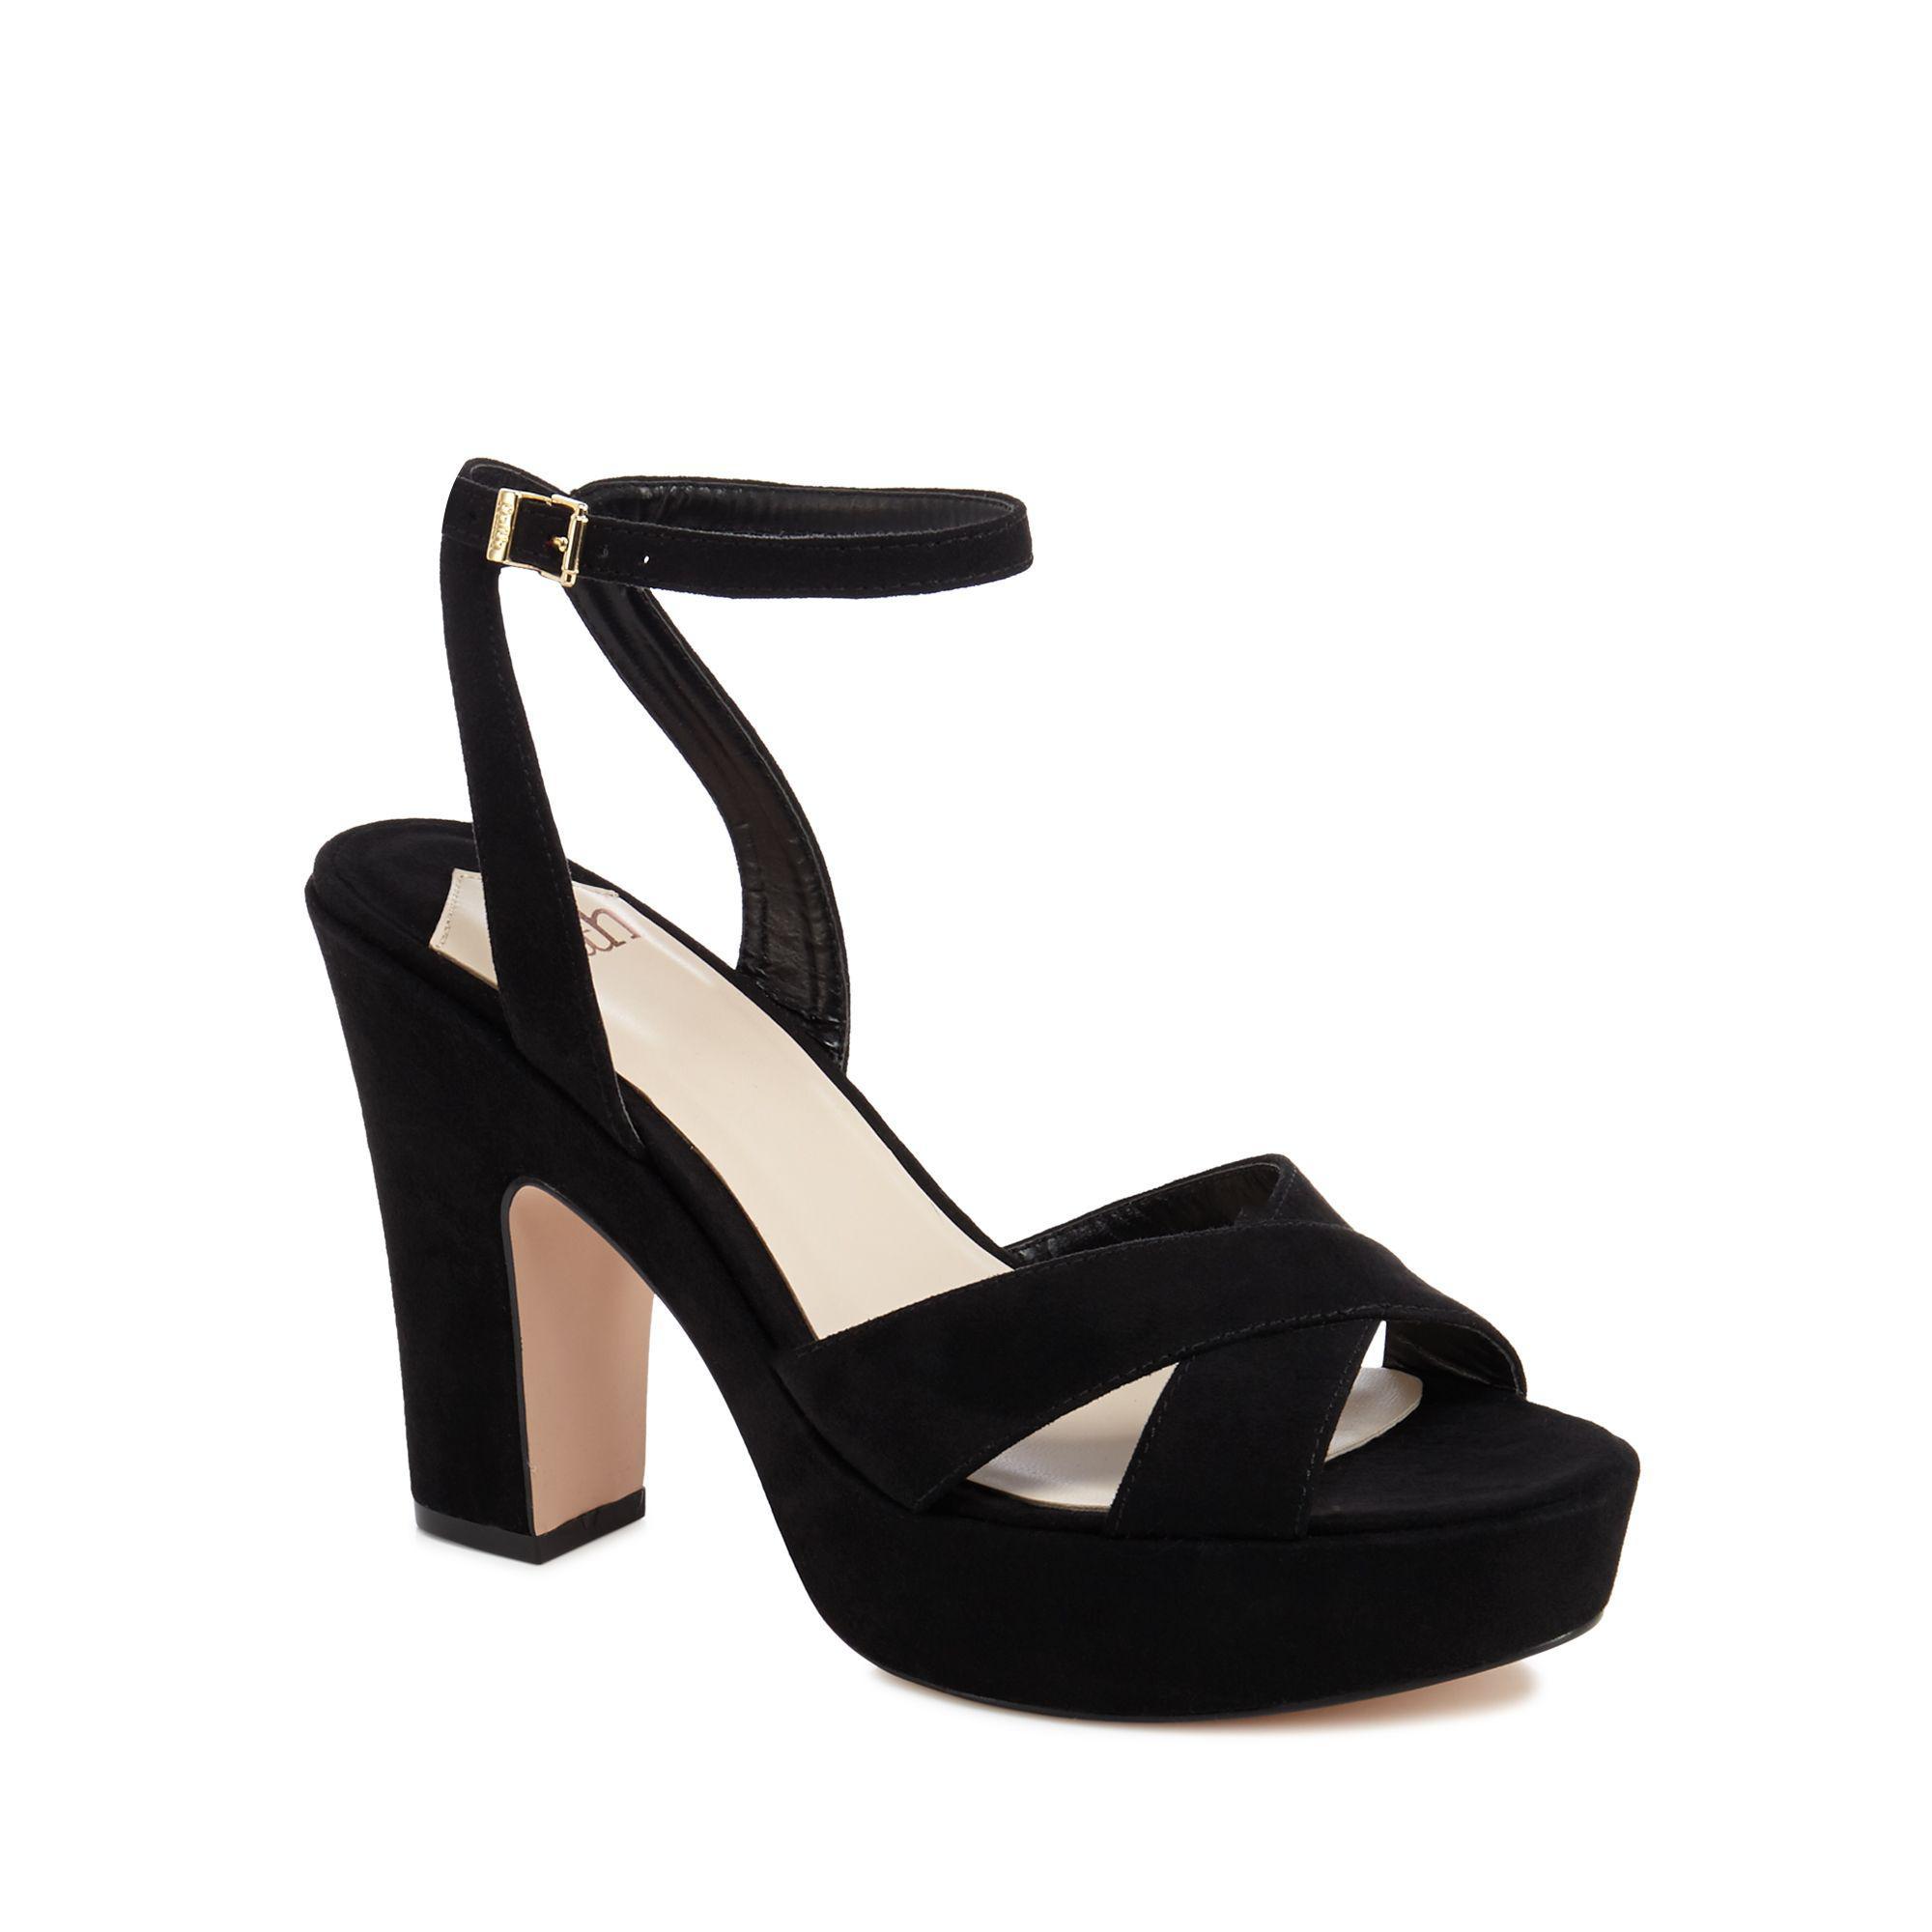 60411b94fe Faith Black Suedette 'dorm' High Block Heel Ankle Strap Sandals in ...